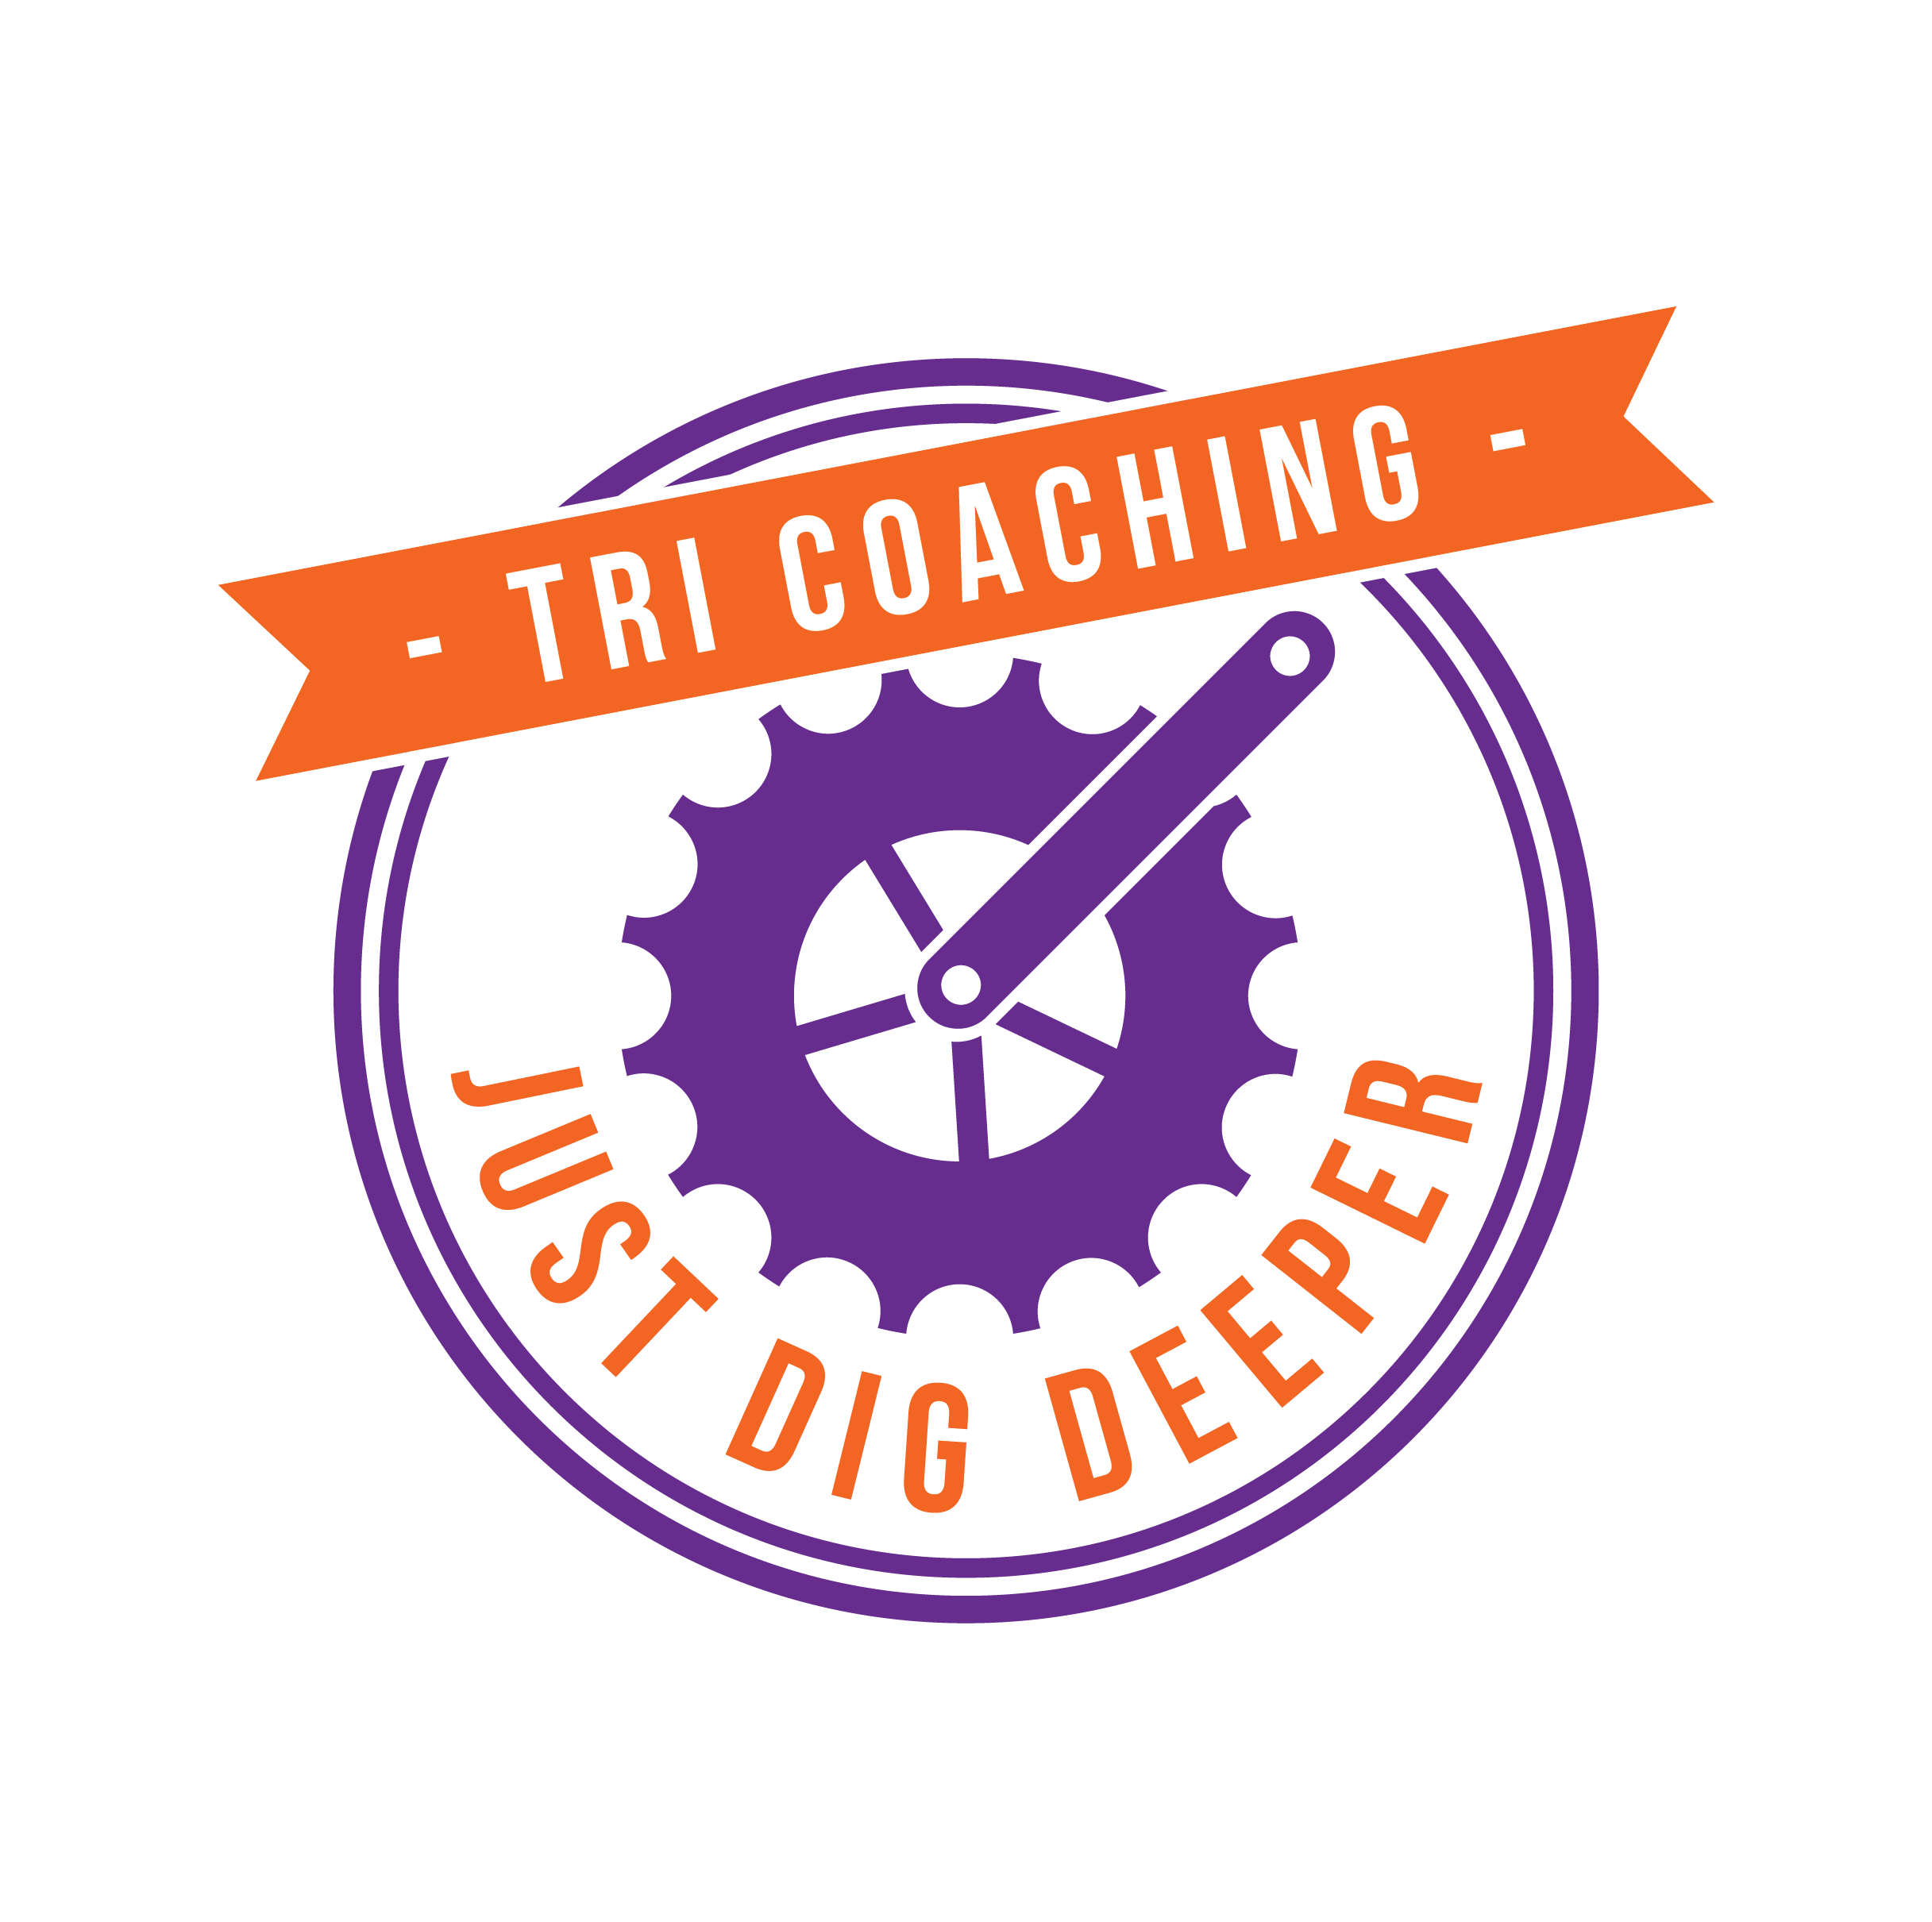 Just Dig Deep - Triathlon Training - Log